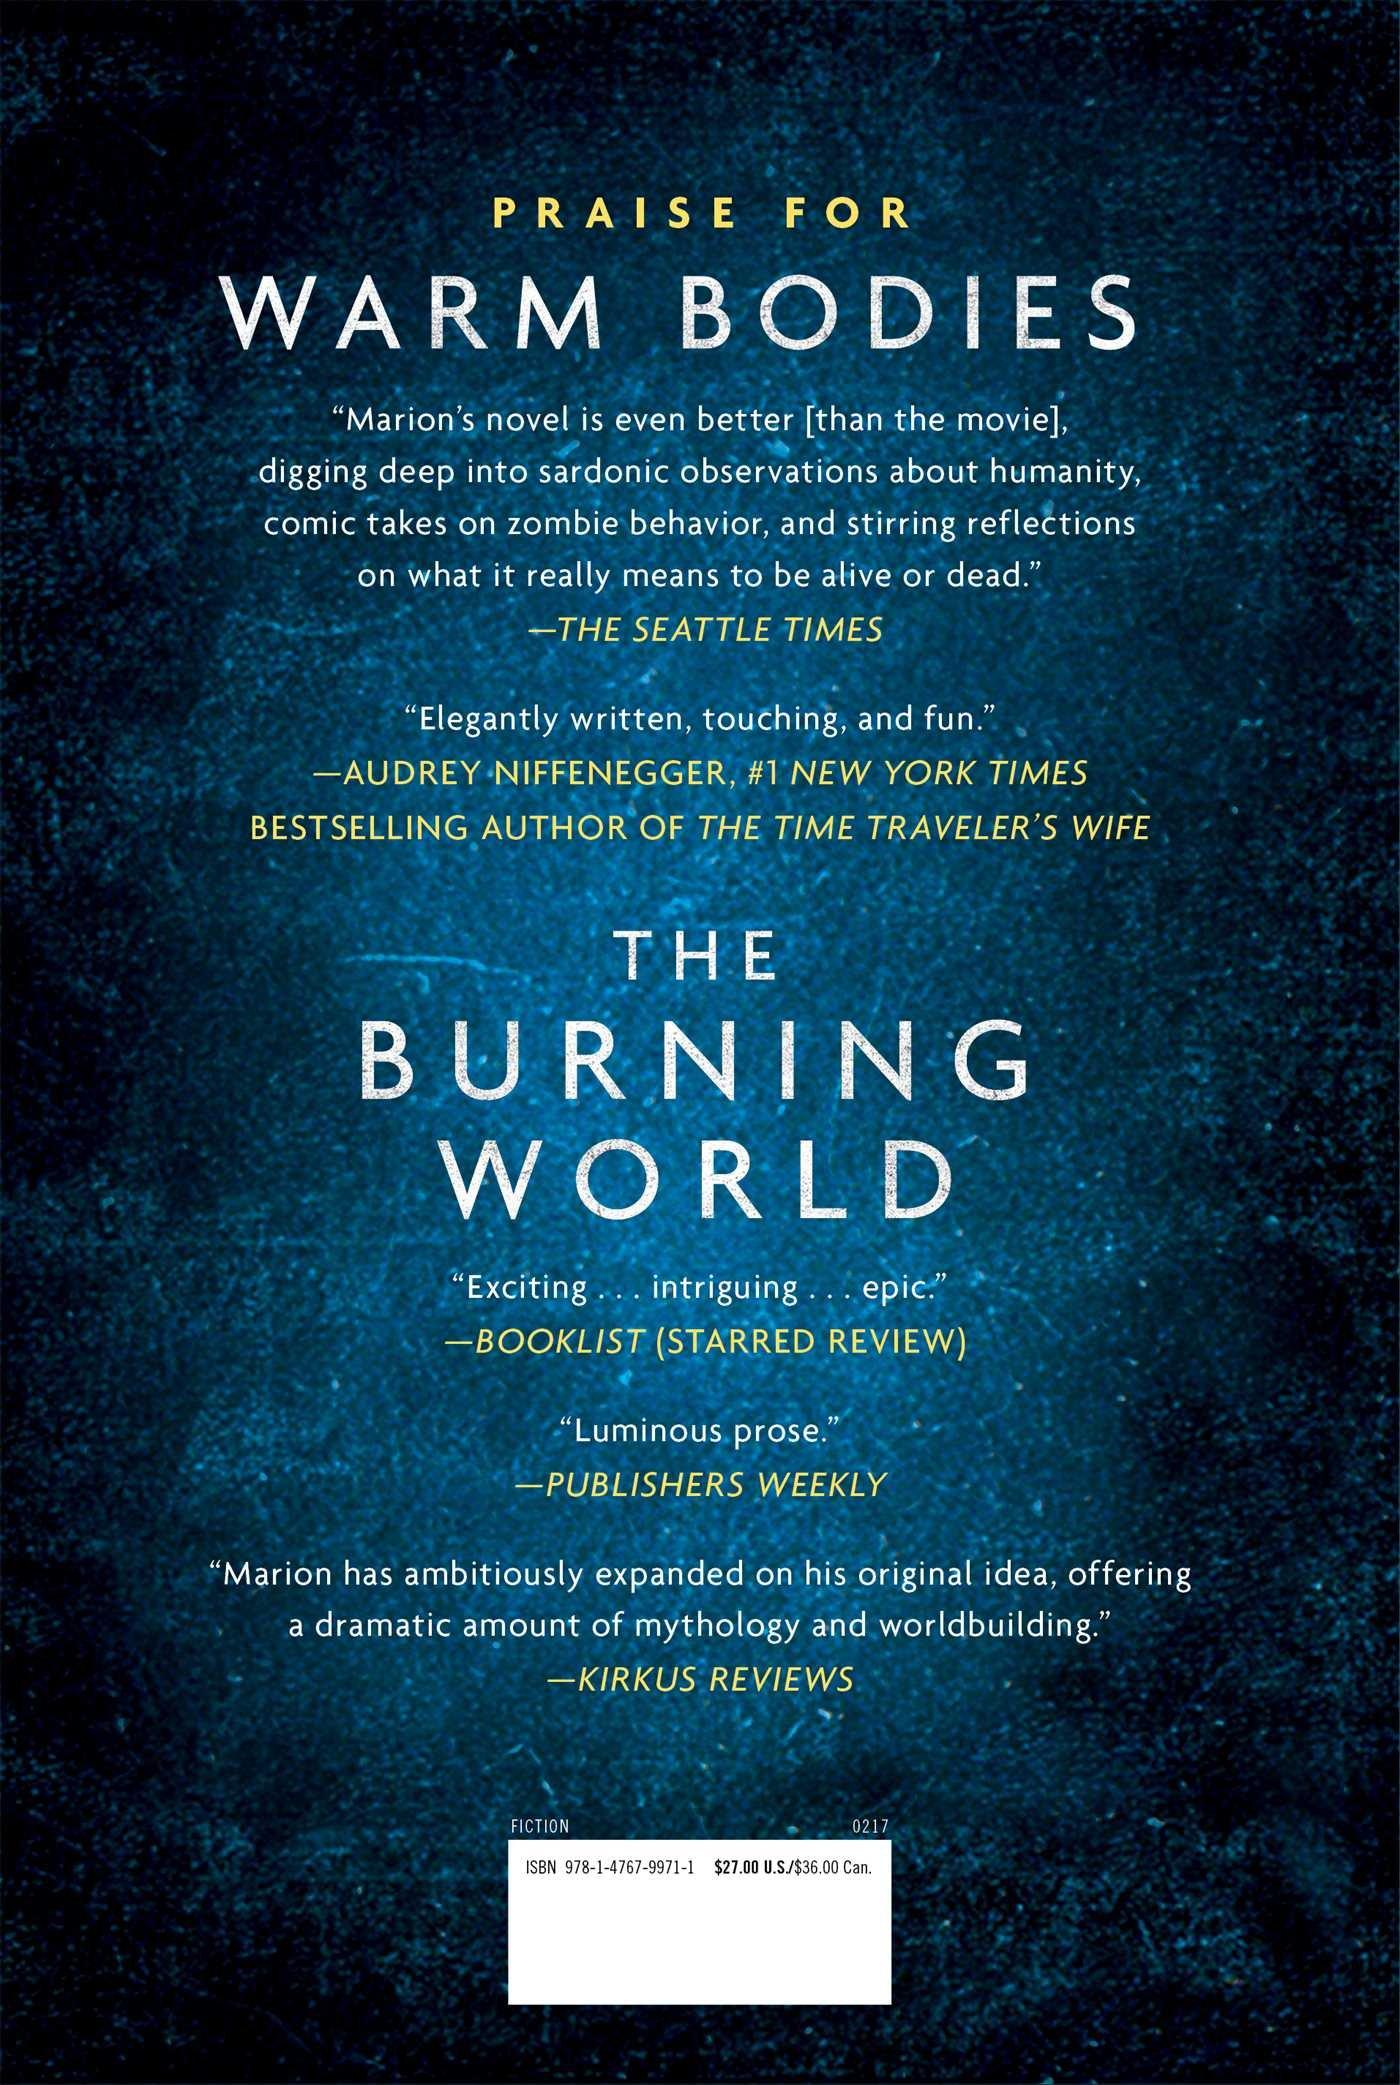 The Burning World: A Warm Bodies Novel  Livros Na Amazon Brasil  9781476799711